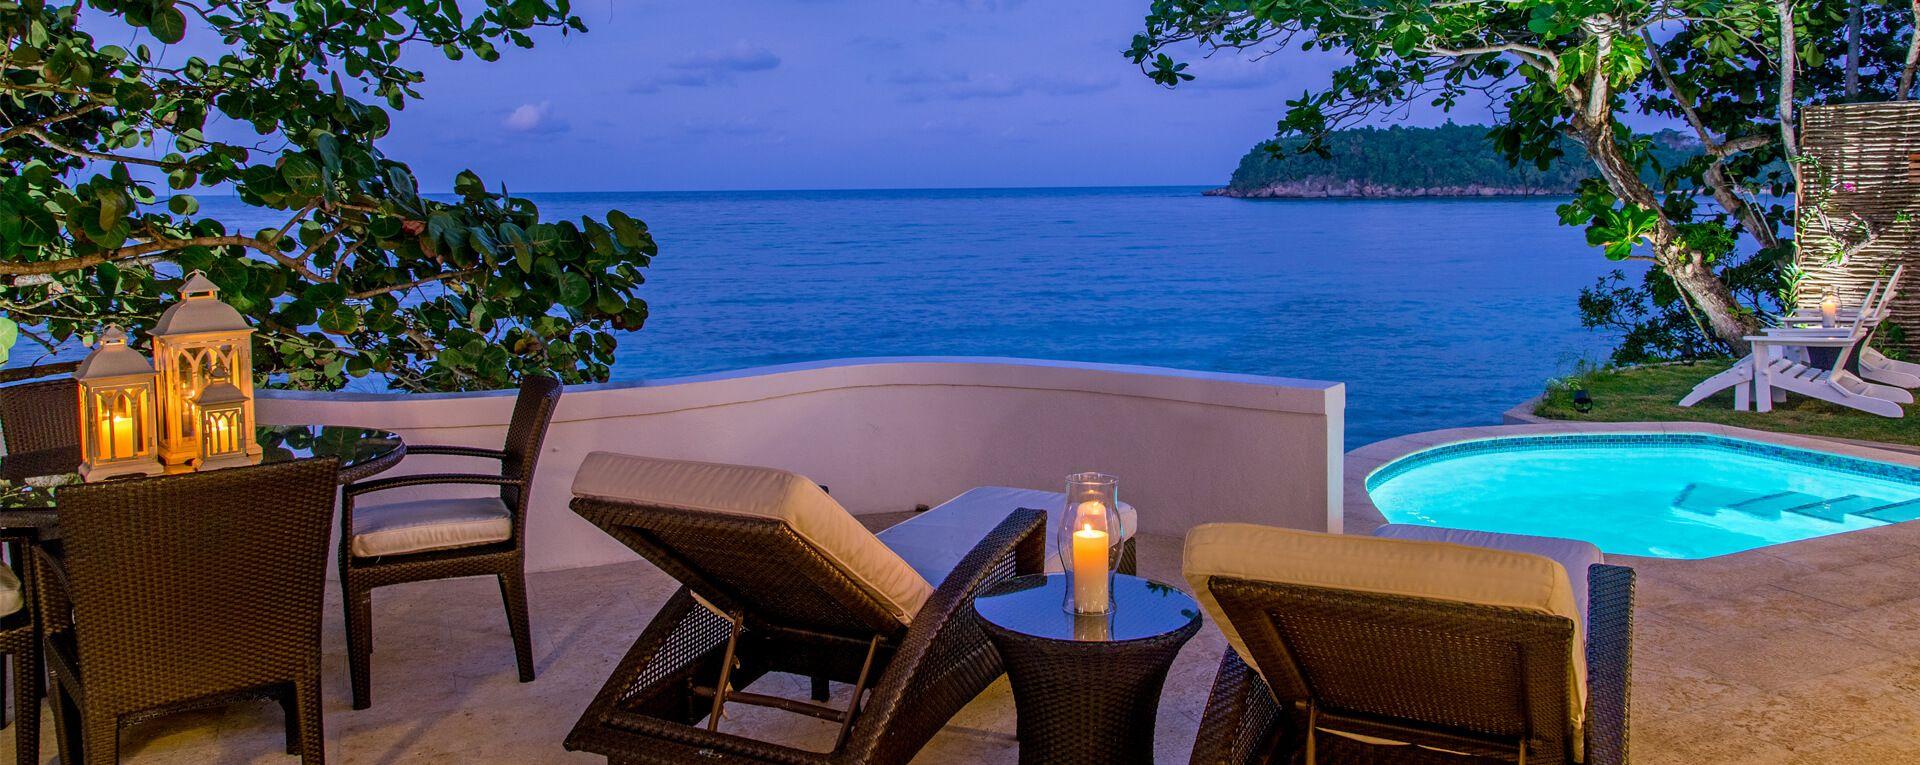 Jamaica Inn & Spa